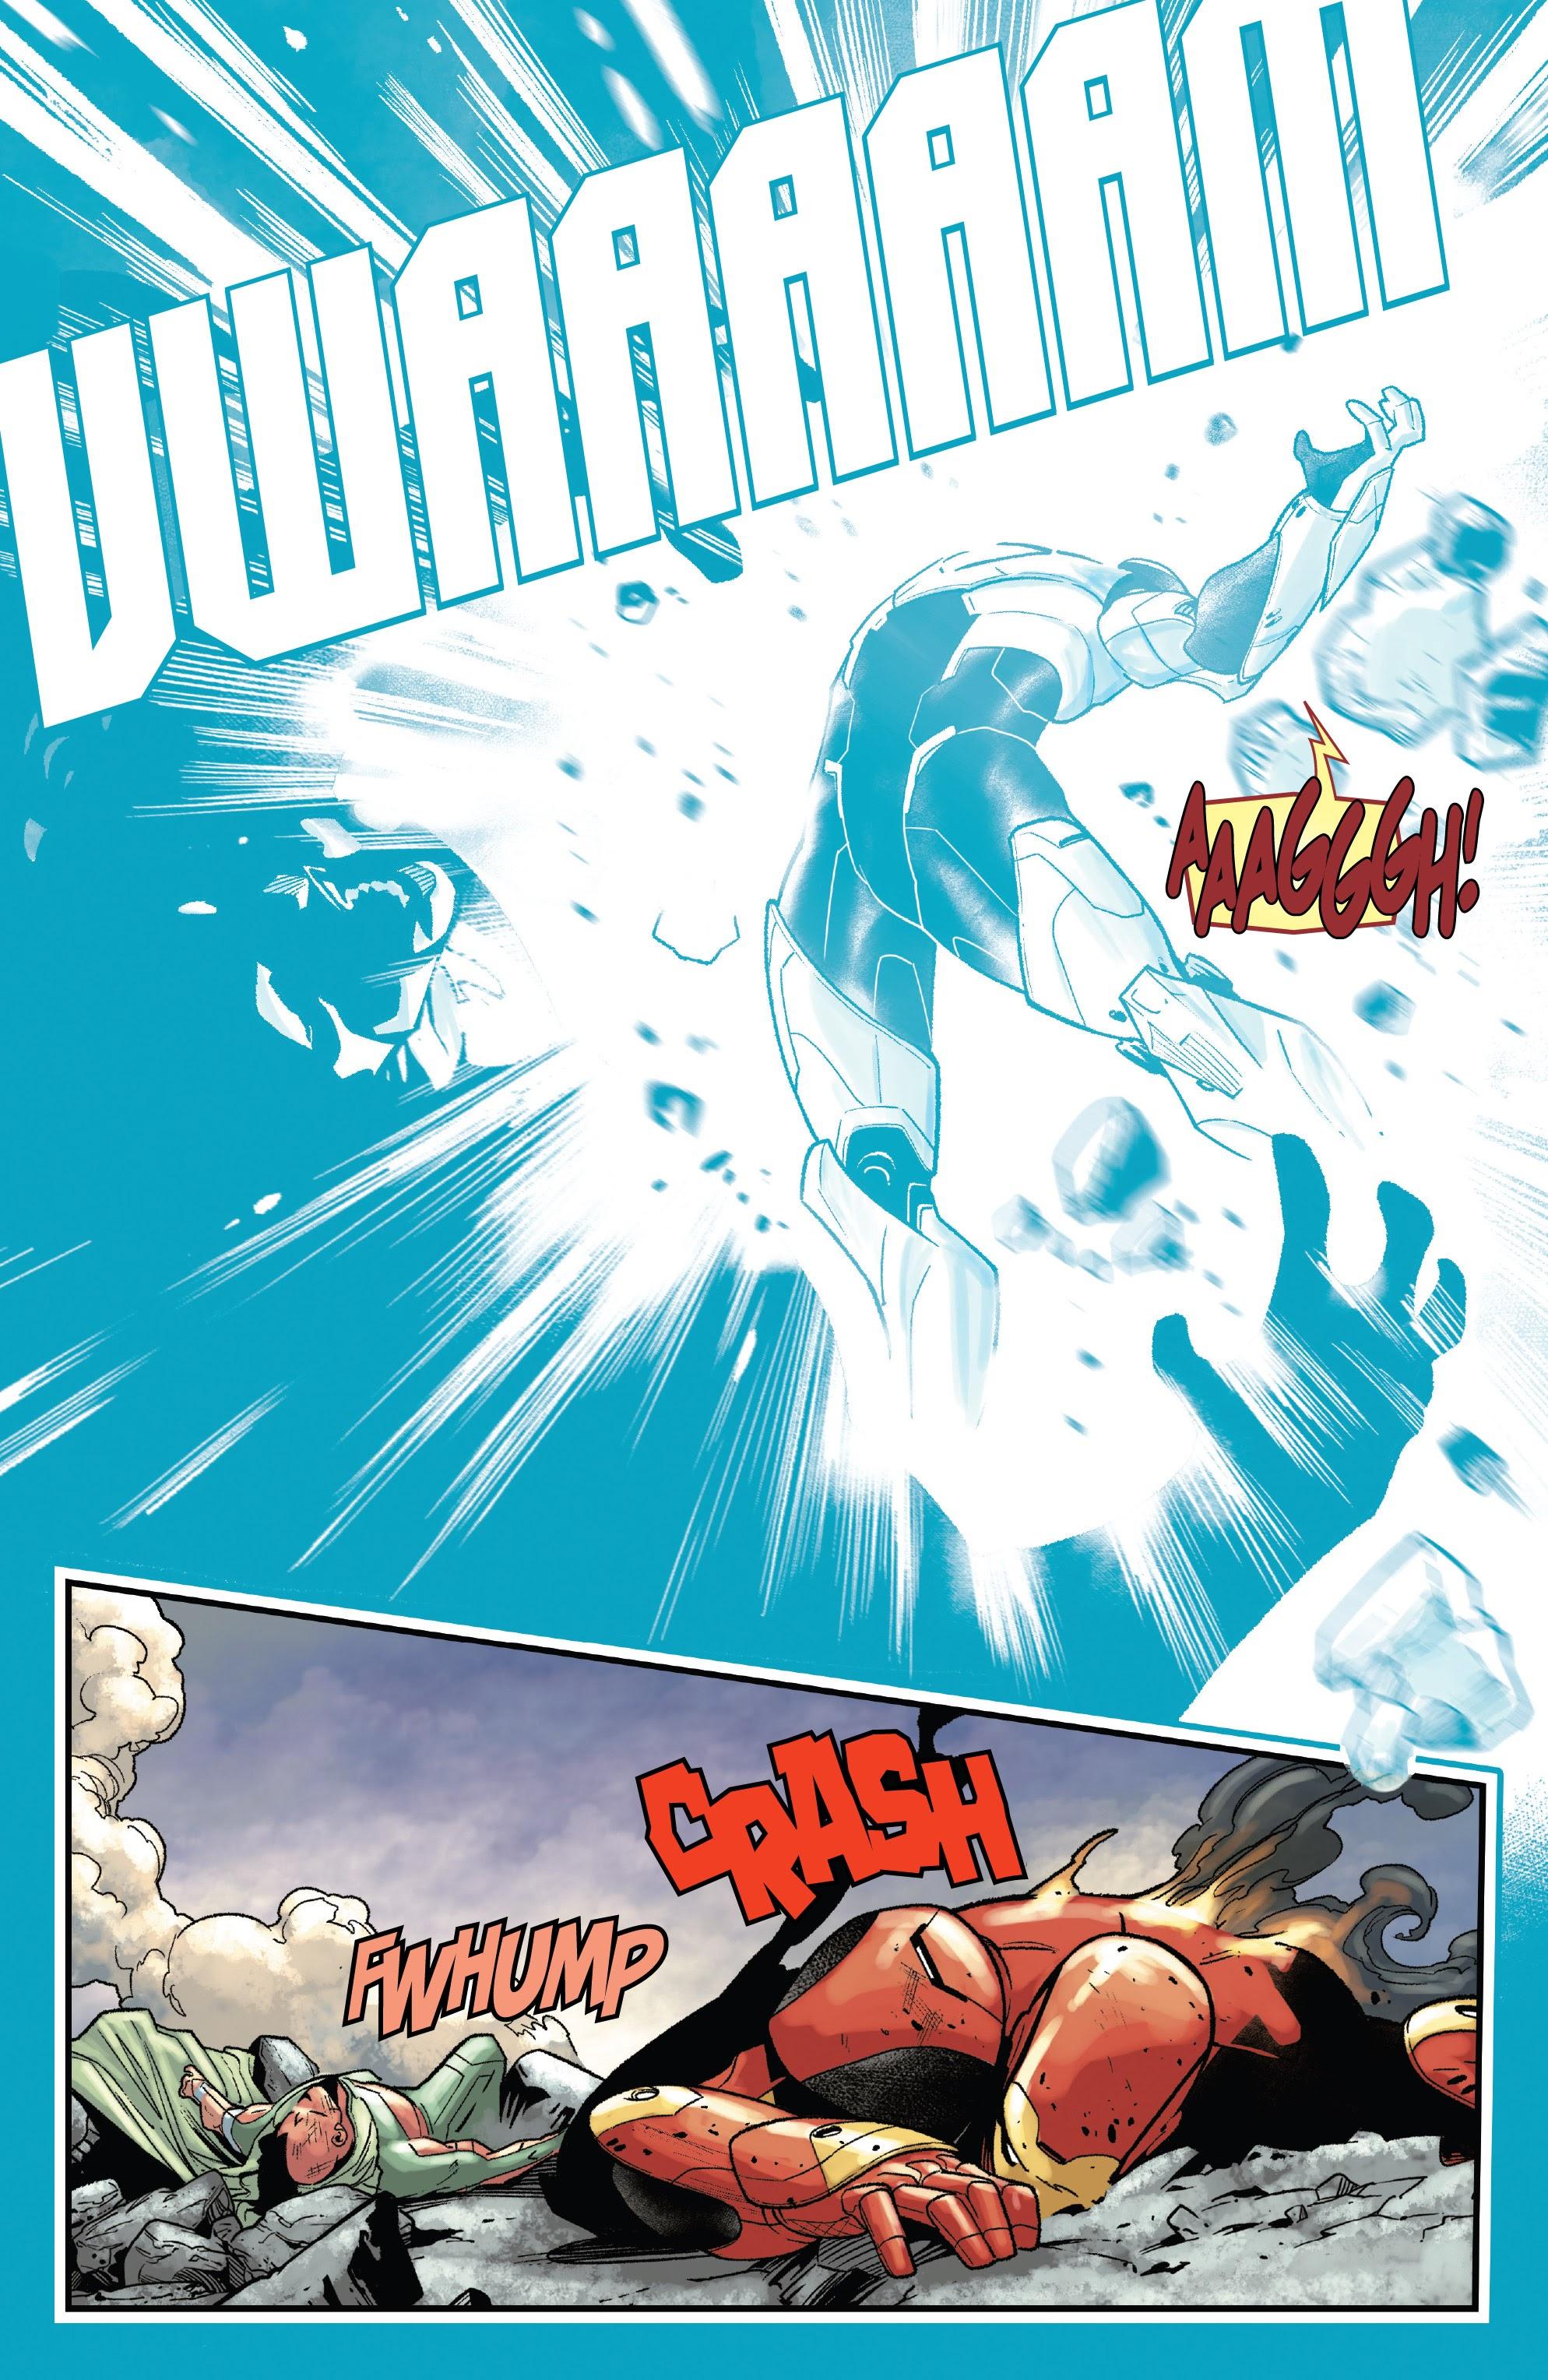 Read online Tony Stark: Iron Man comic -  Issue #15 - 19